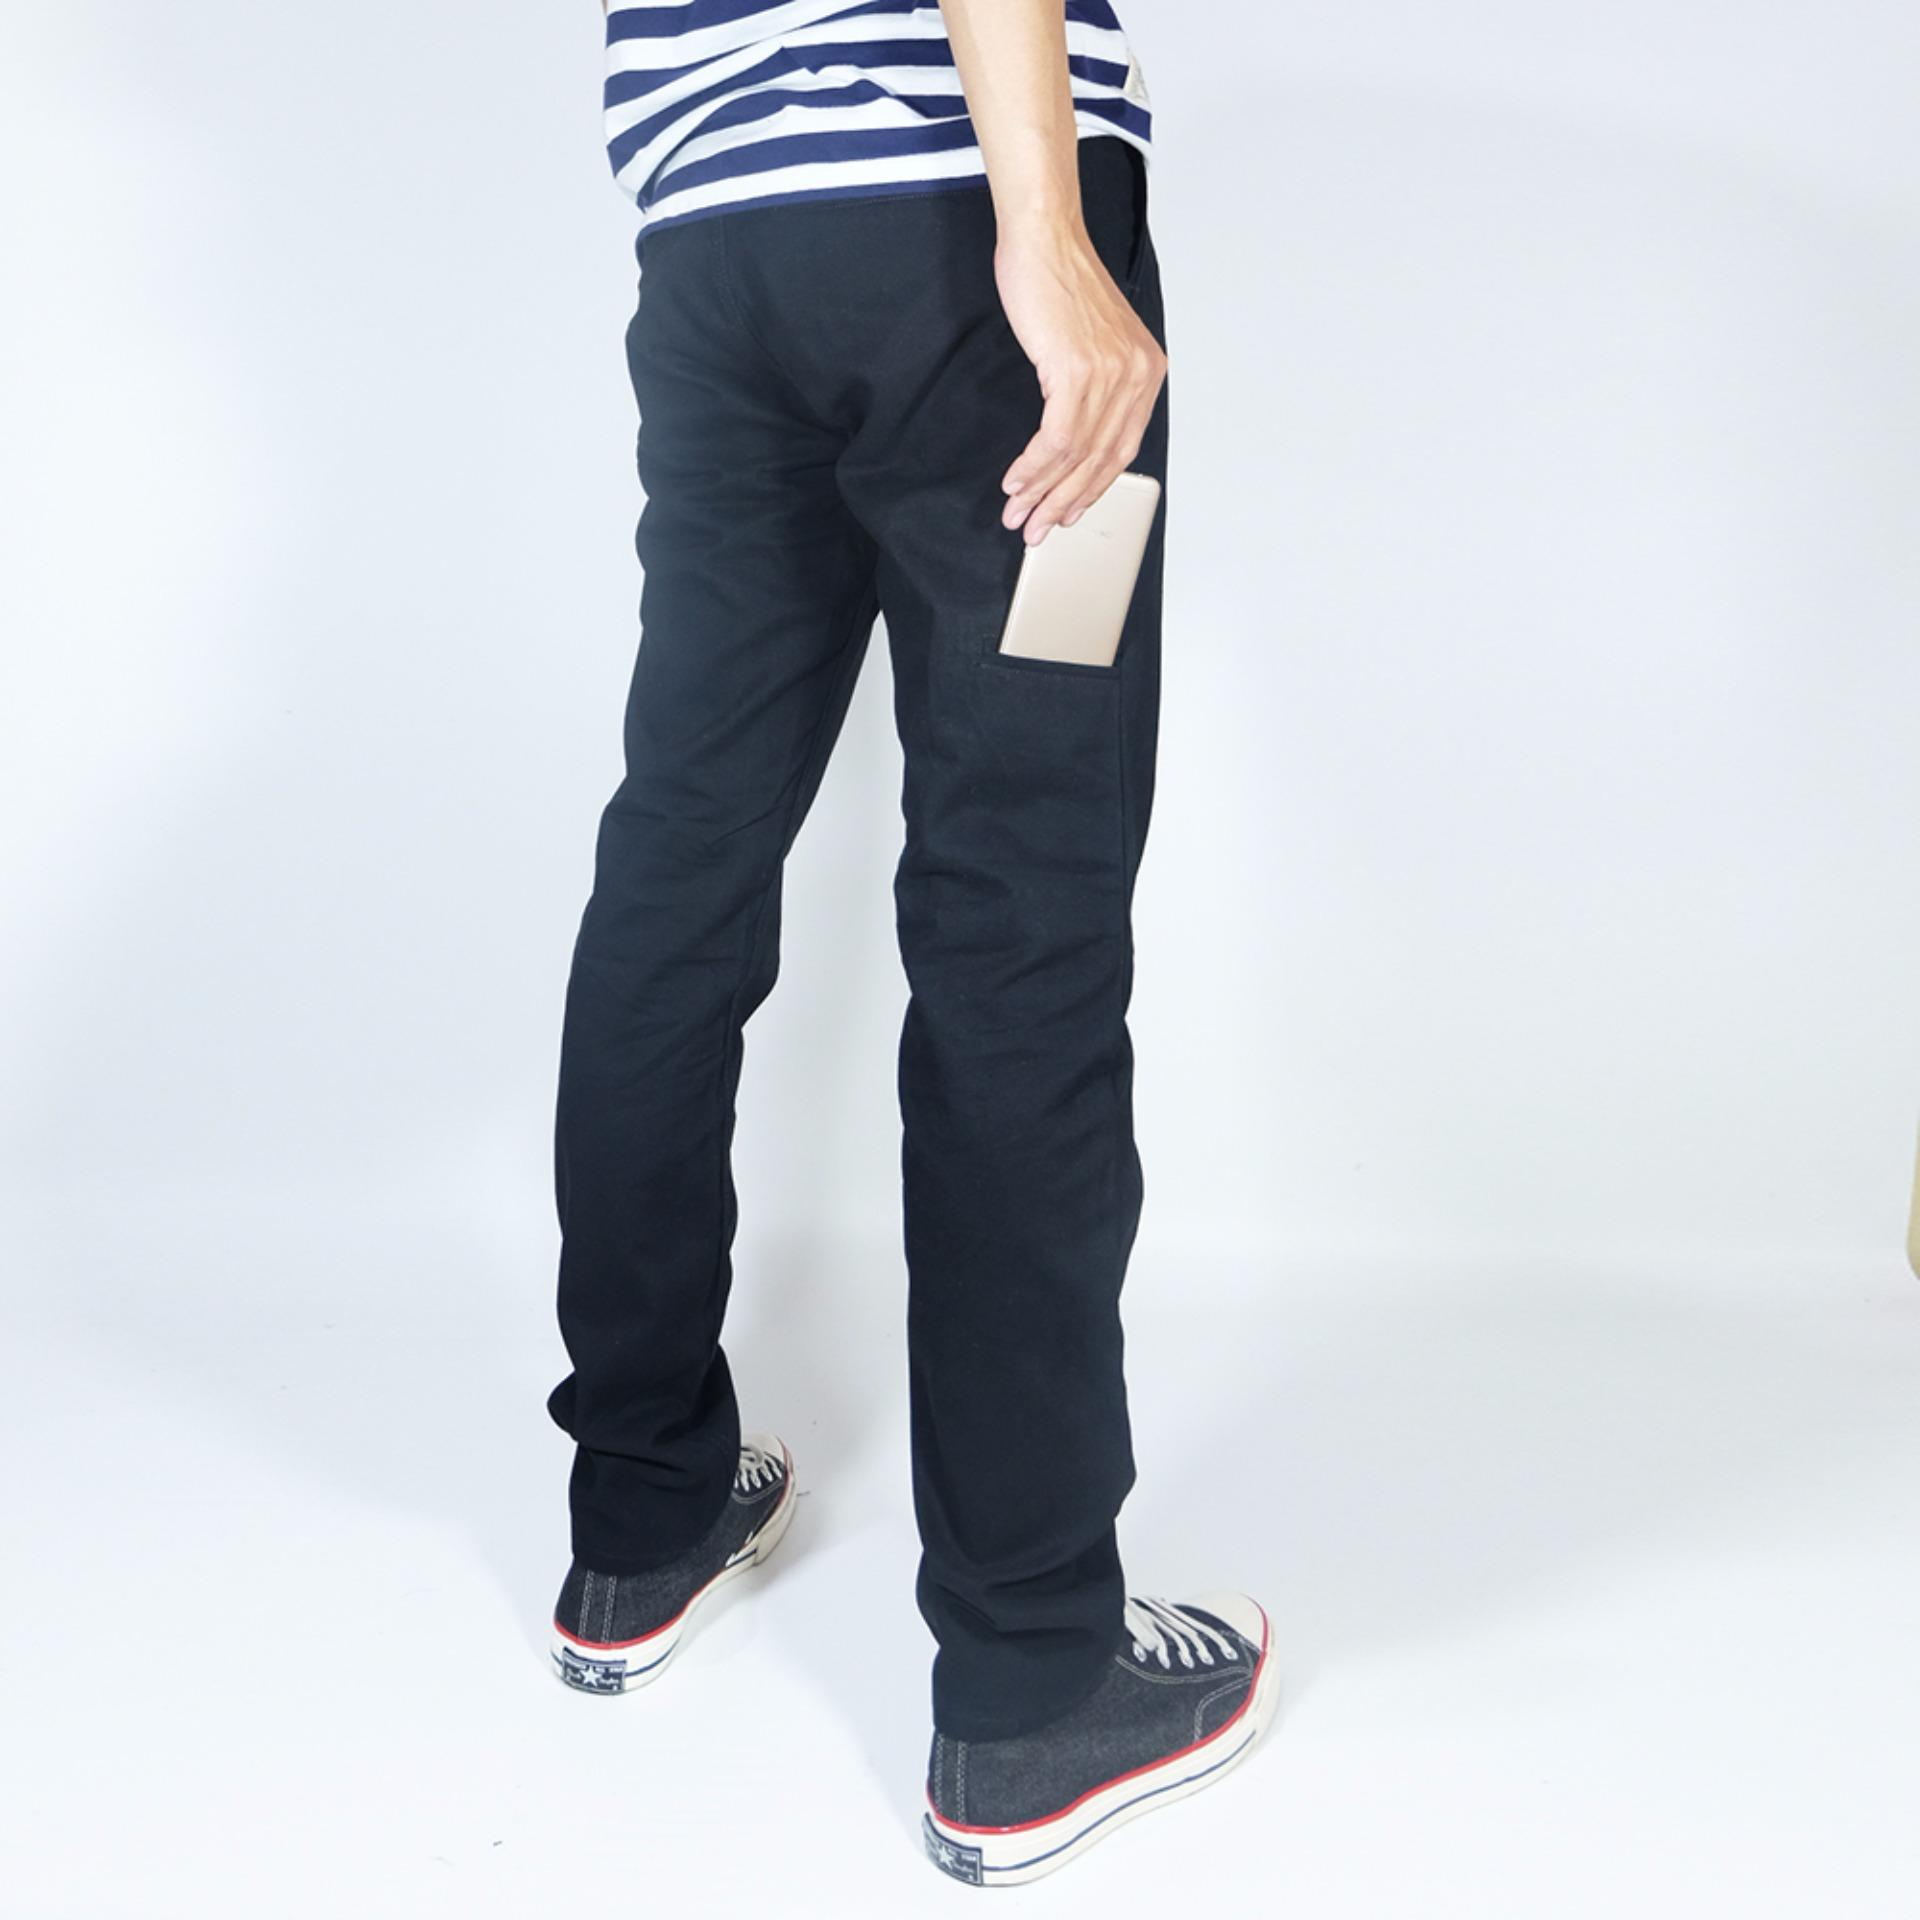 ... NHS Celana Chino Pria Pocket Straight Fit [Hitam] ...